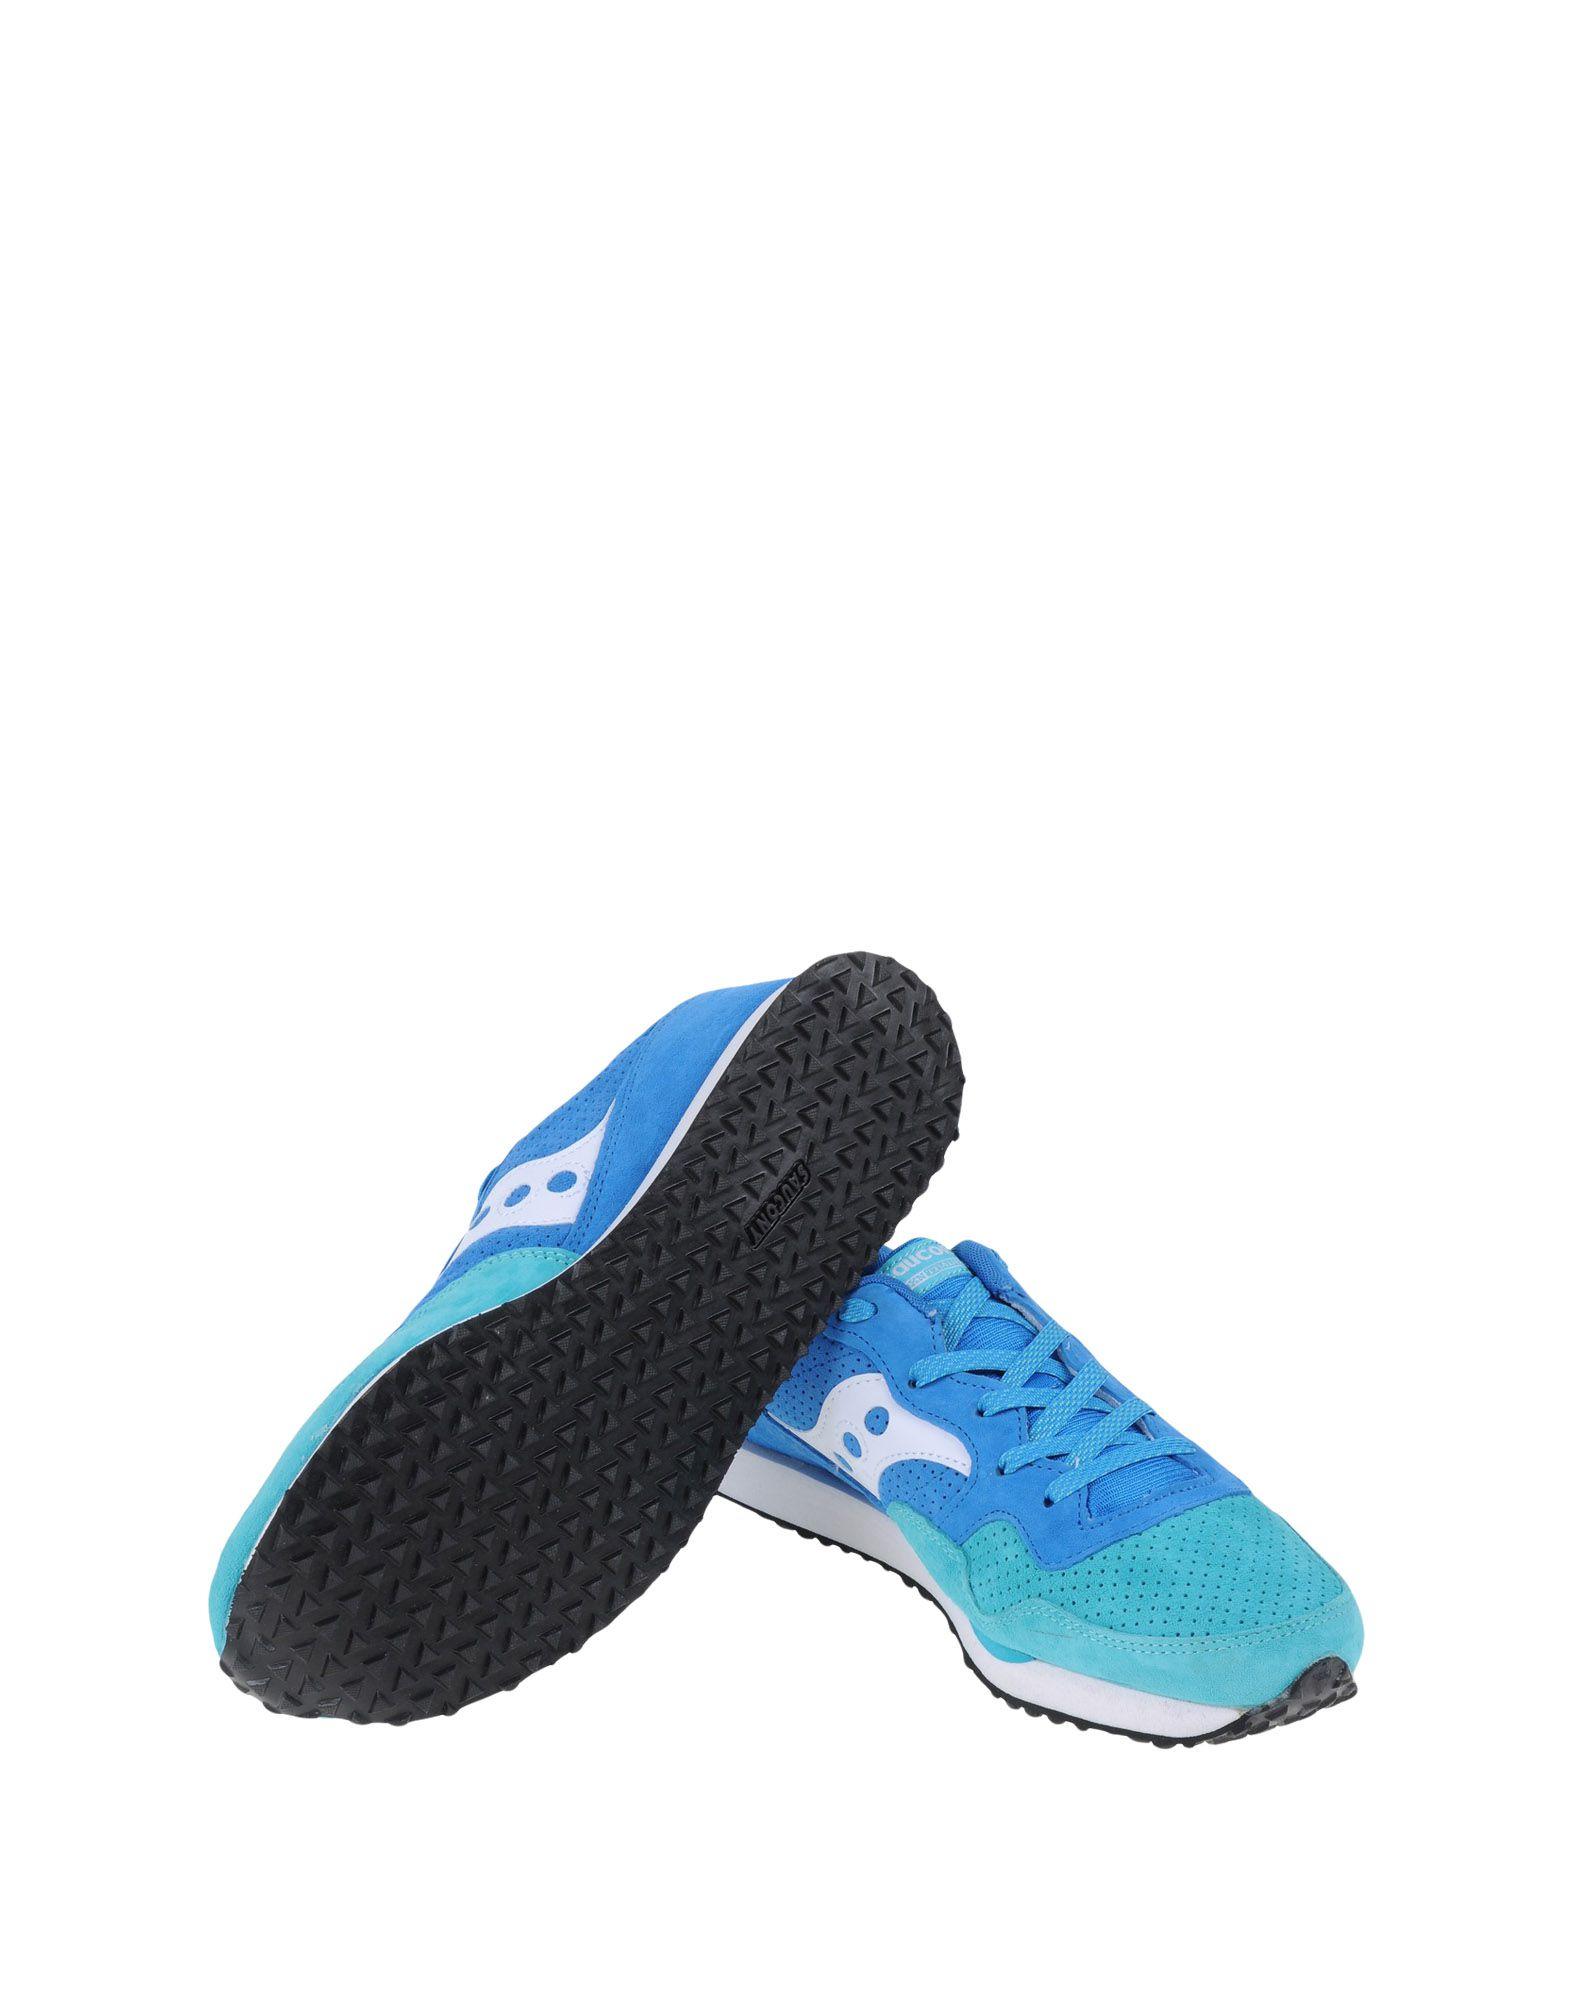 Sneakers Saucony Dxn Triner Bermuda Pack Lmt Ed. - Homme - Sneakers Saucony sur